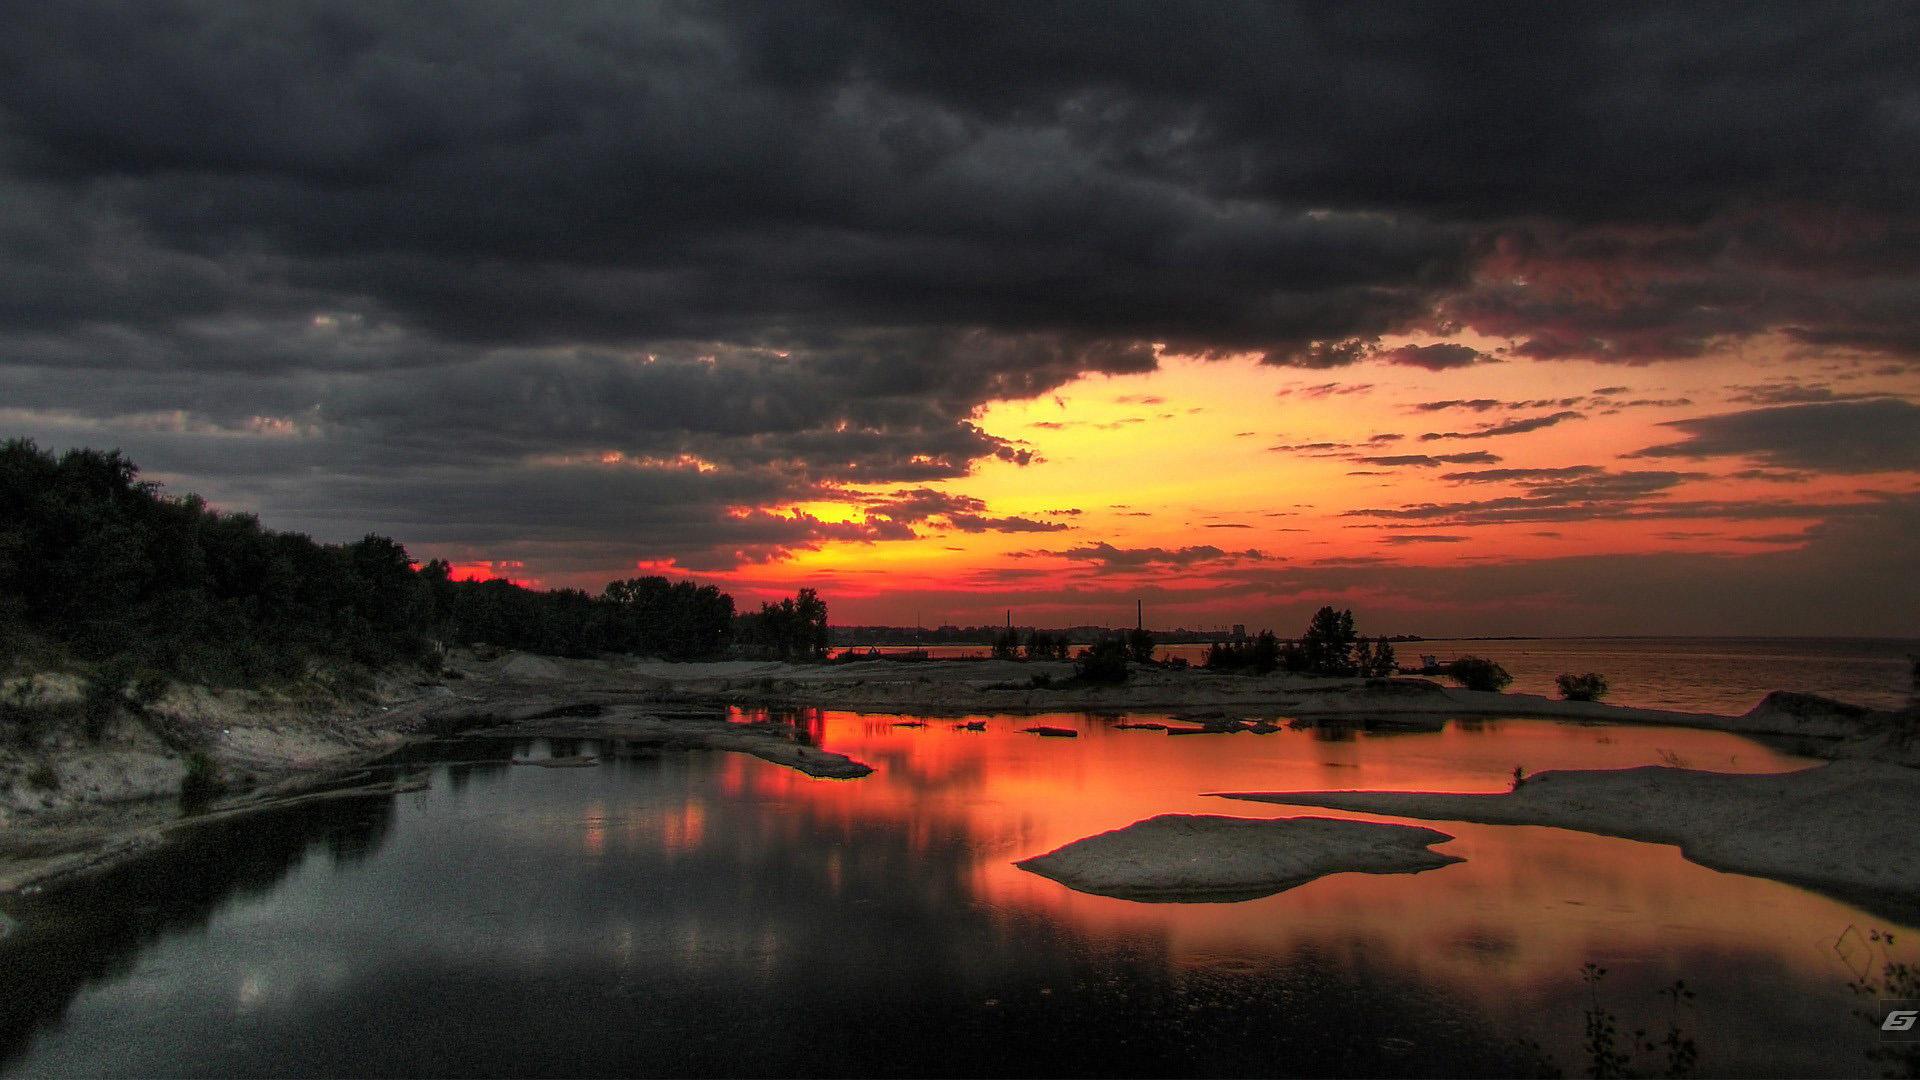 nature wallpaper beautiful desktop sunset stage landscape 1920x1080